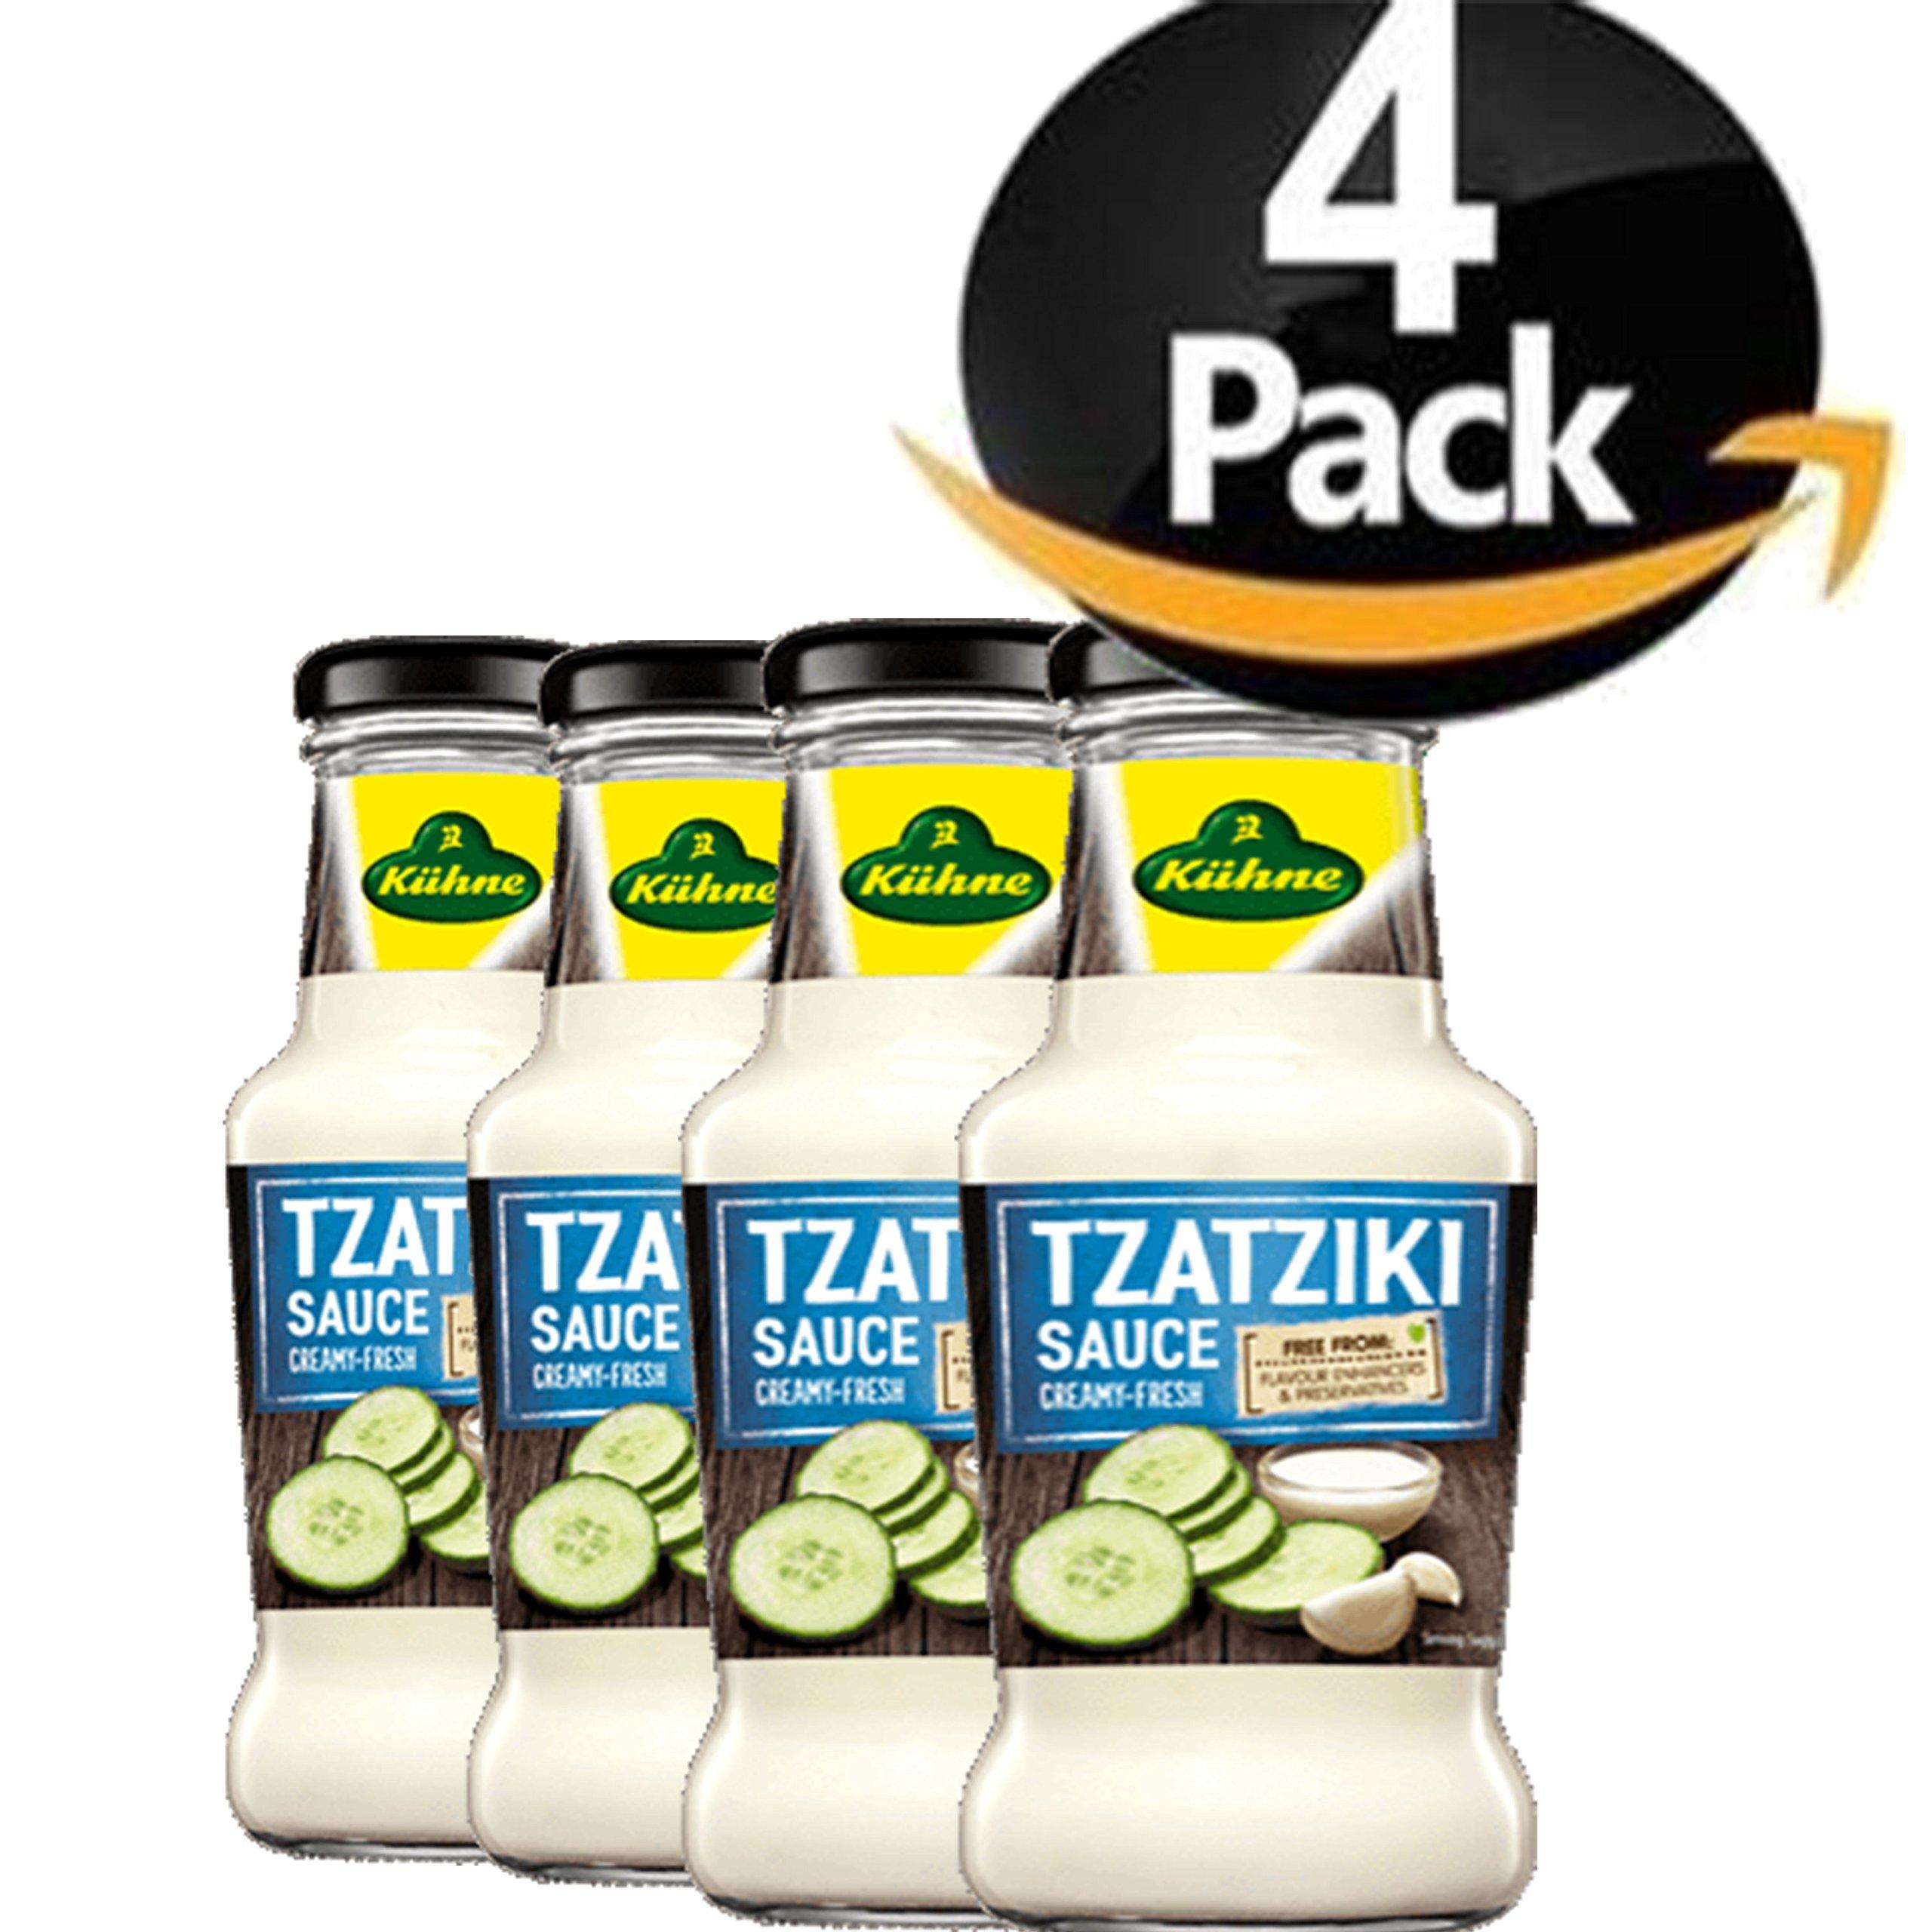 Kuhne Tzaziki Sauce BUNDLE 4 Bottles 8.45oz 250ml Each